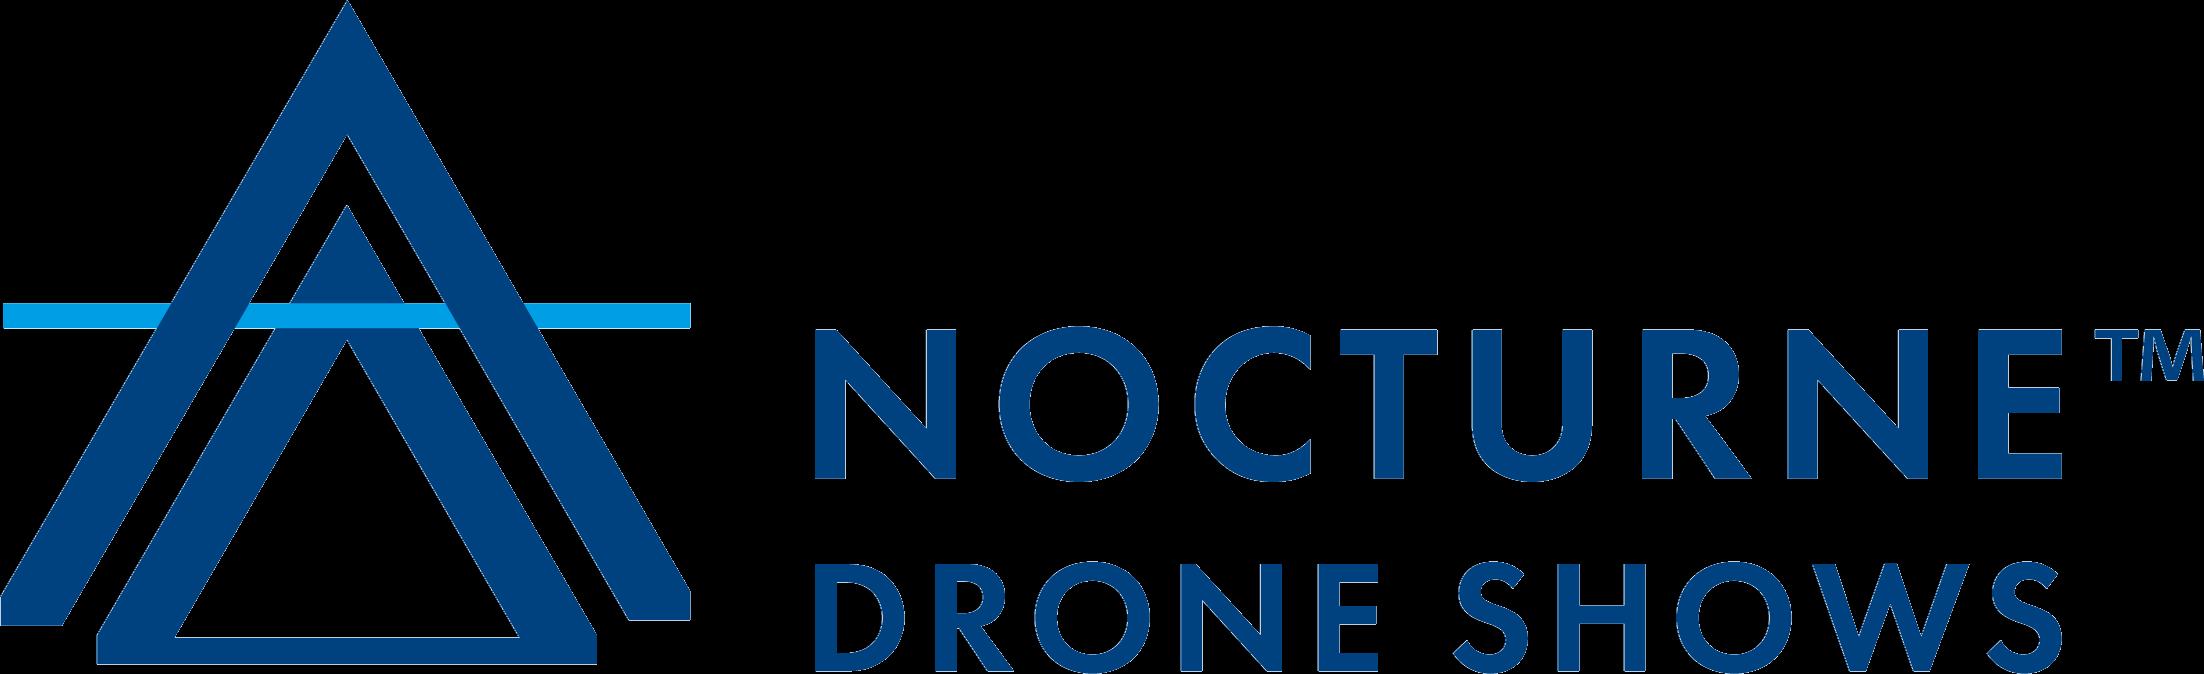 Nocturne Drone Shows